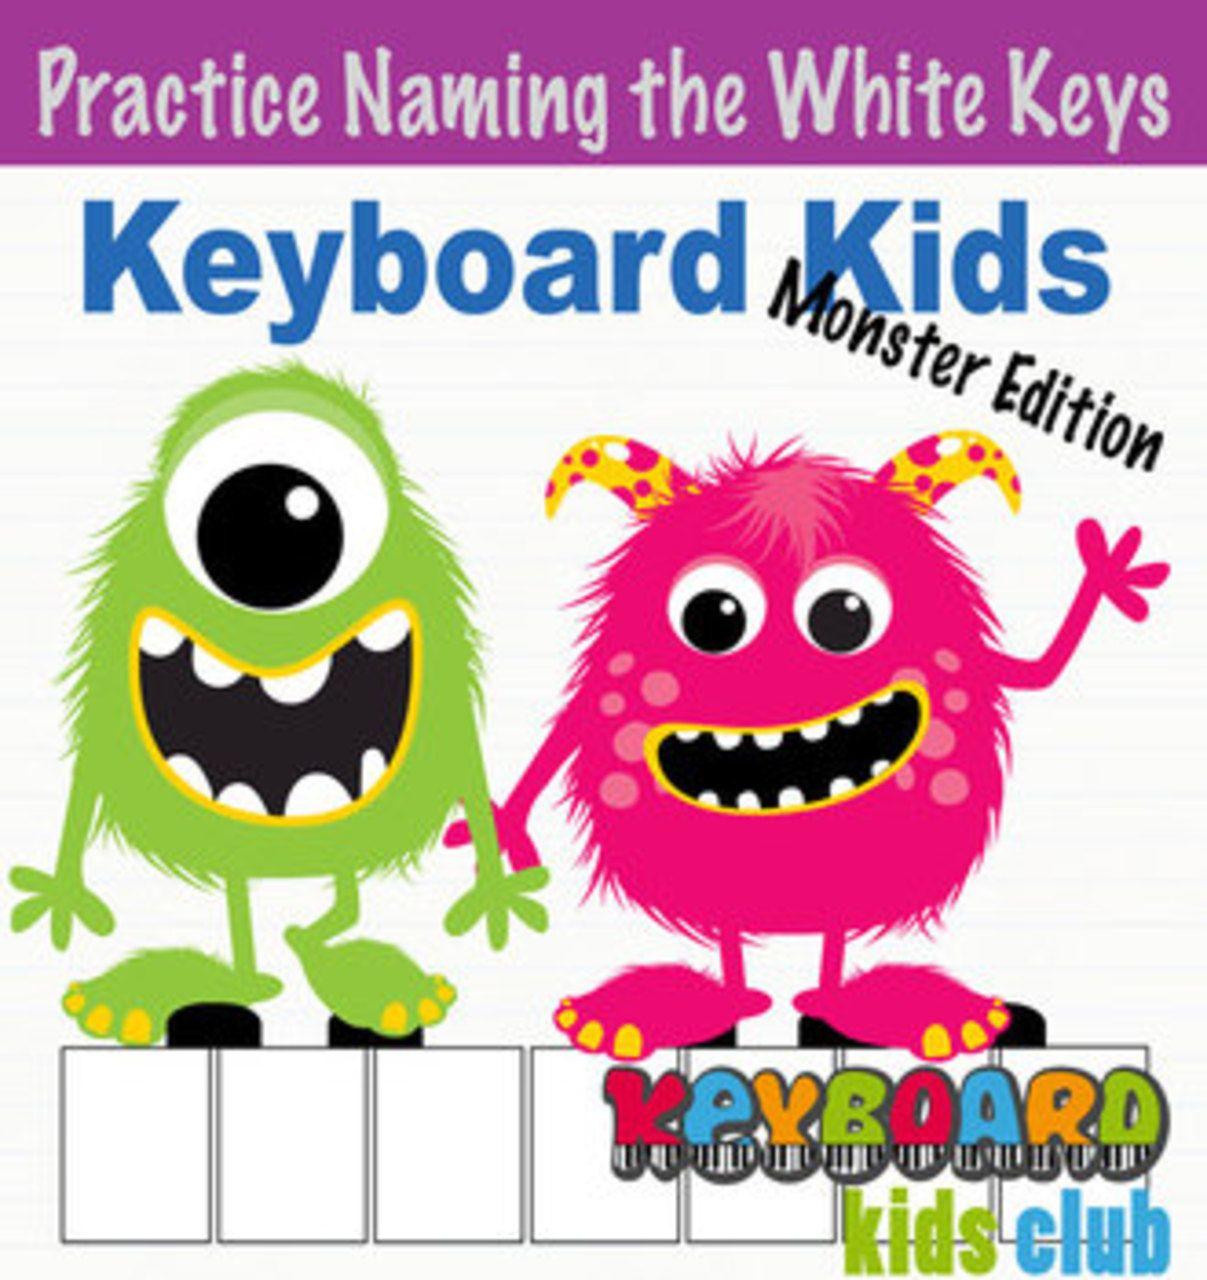 Keyboard Kids Monsters Printable Piano Key Naming